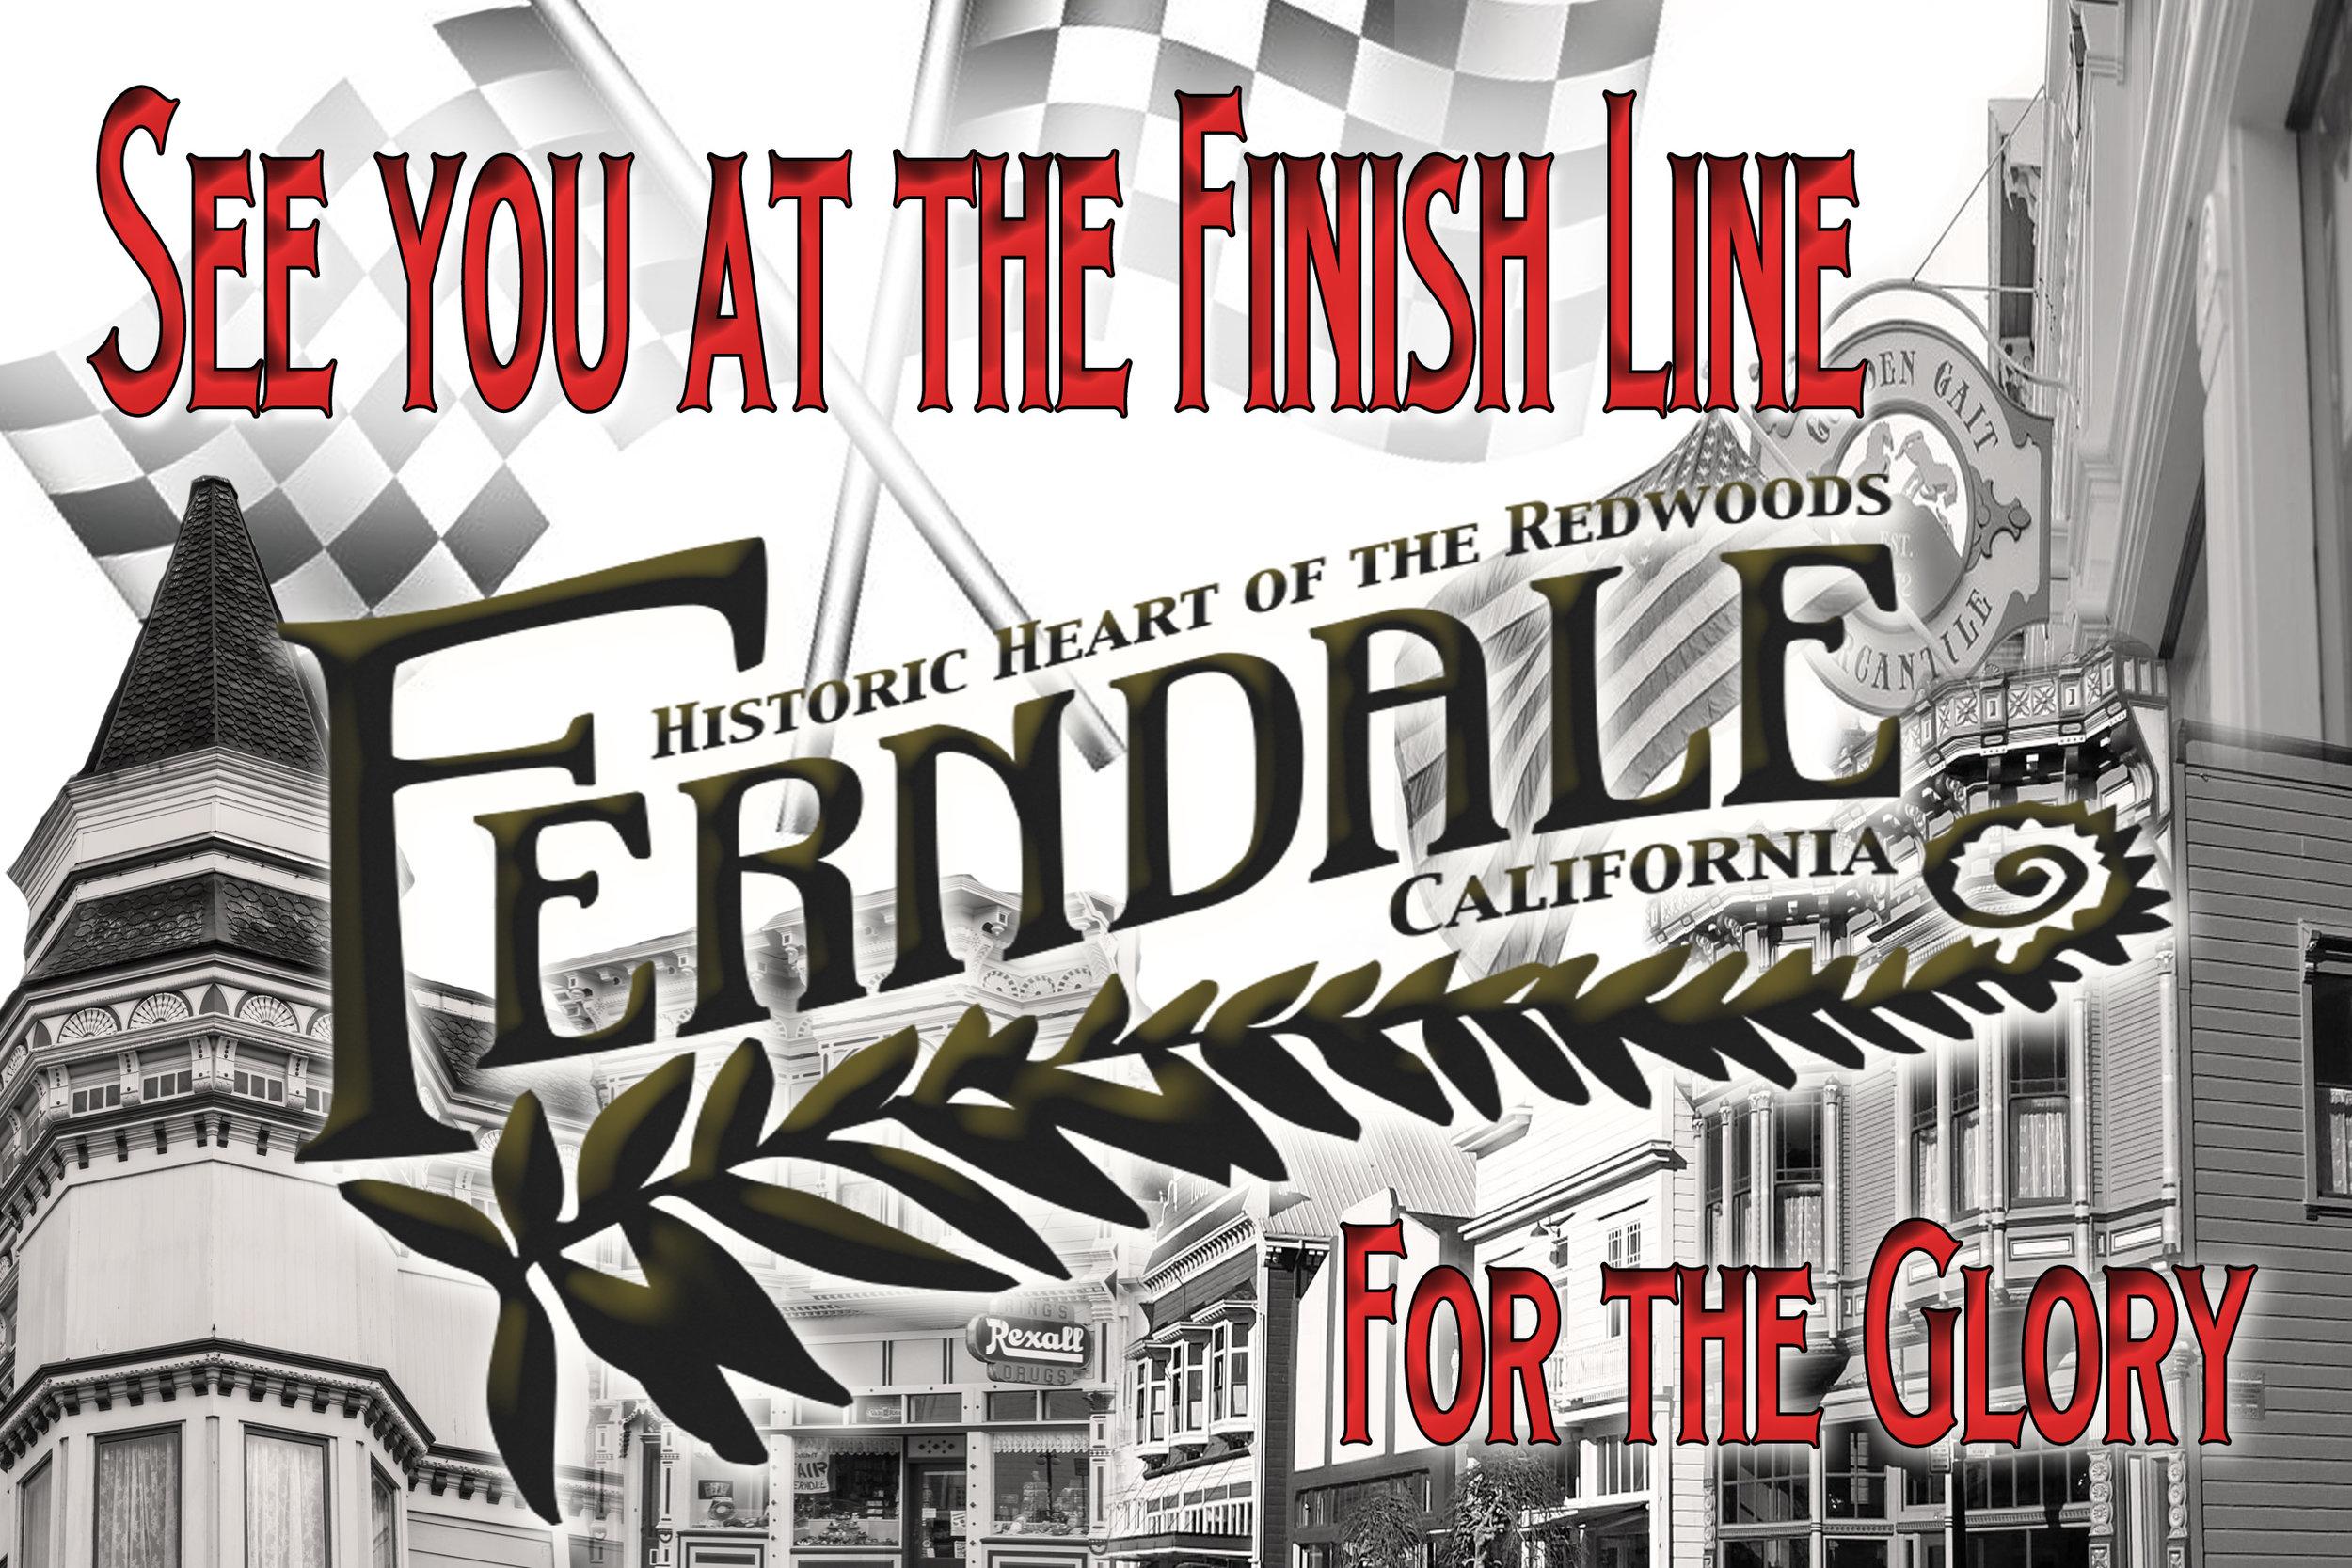 www.visitferndale.com